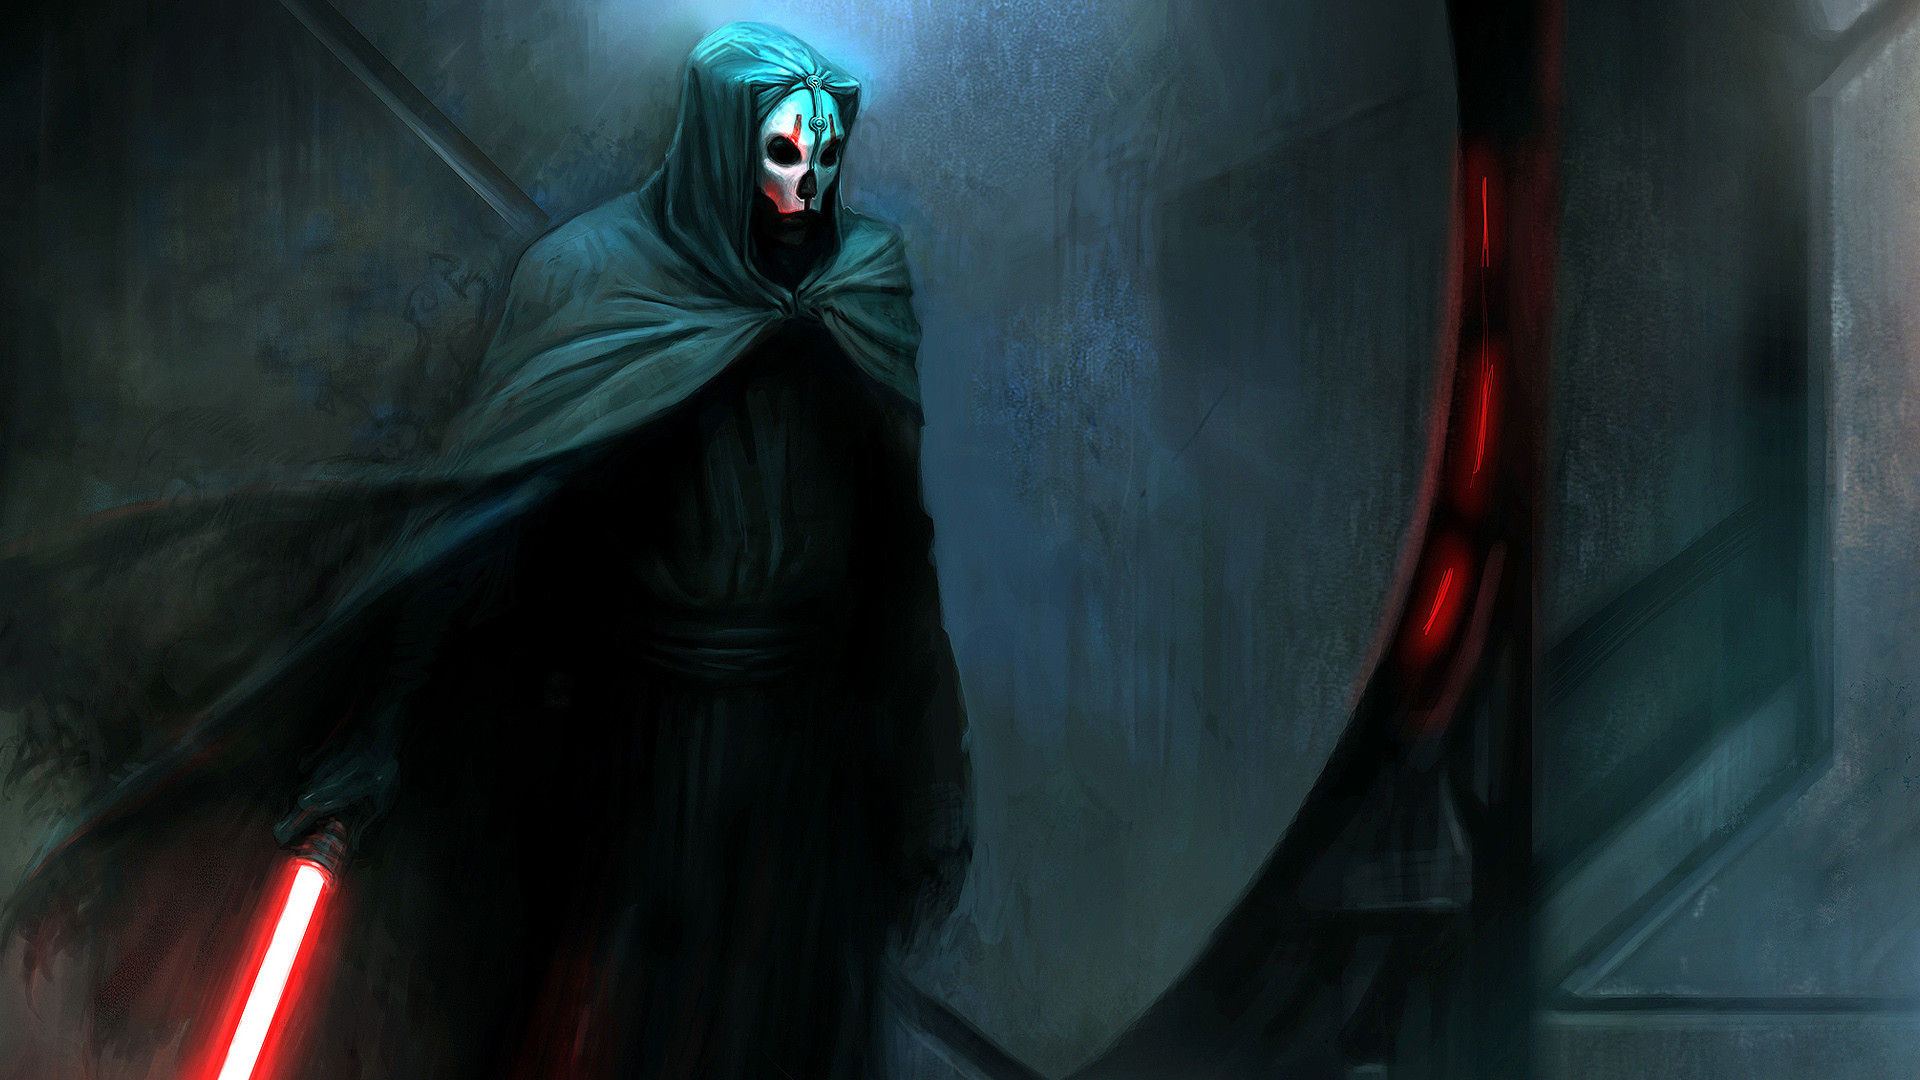 Star Wars Sith Image As Wallpaper HD